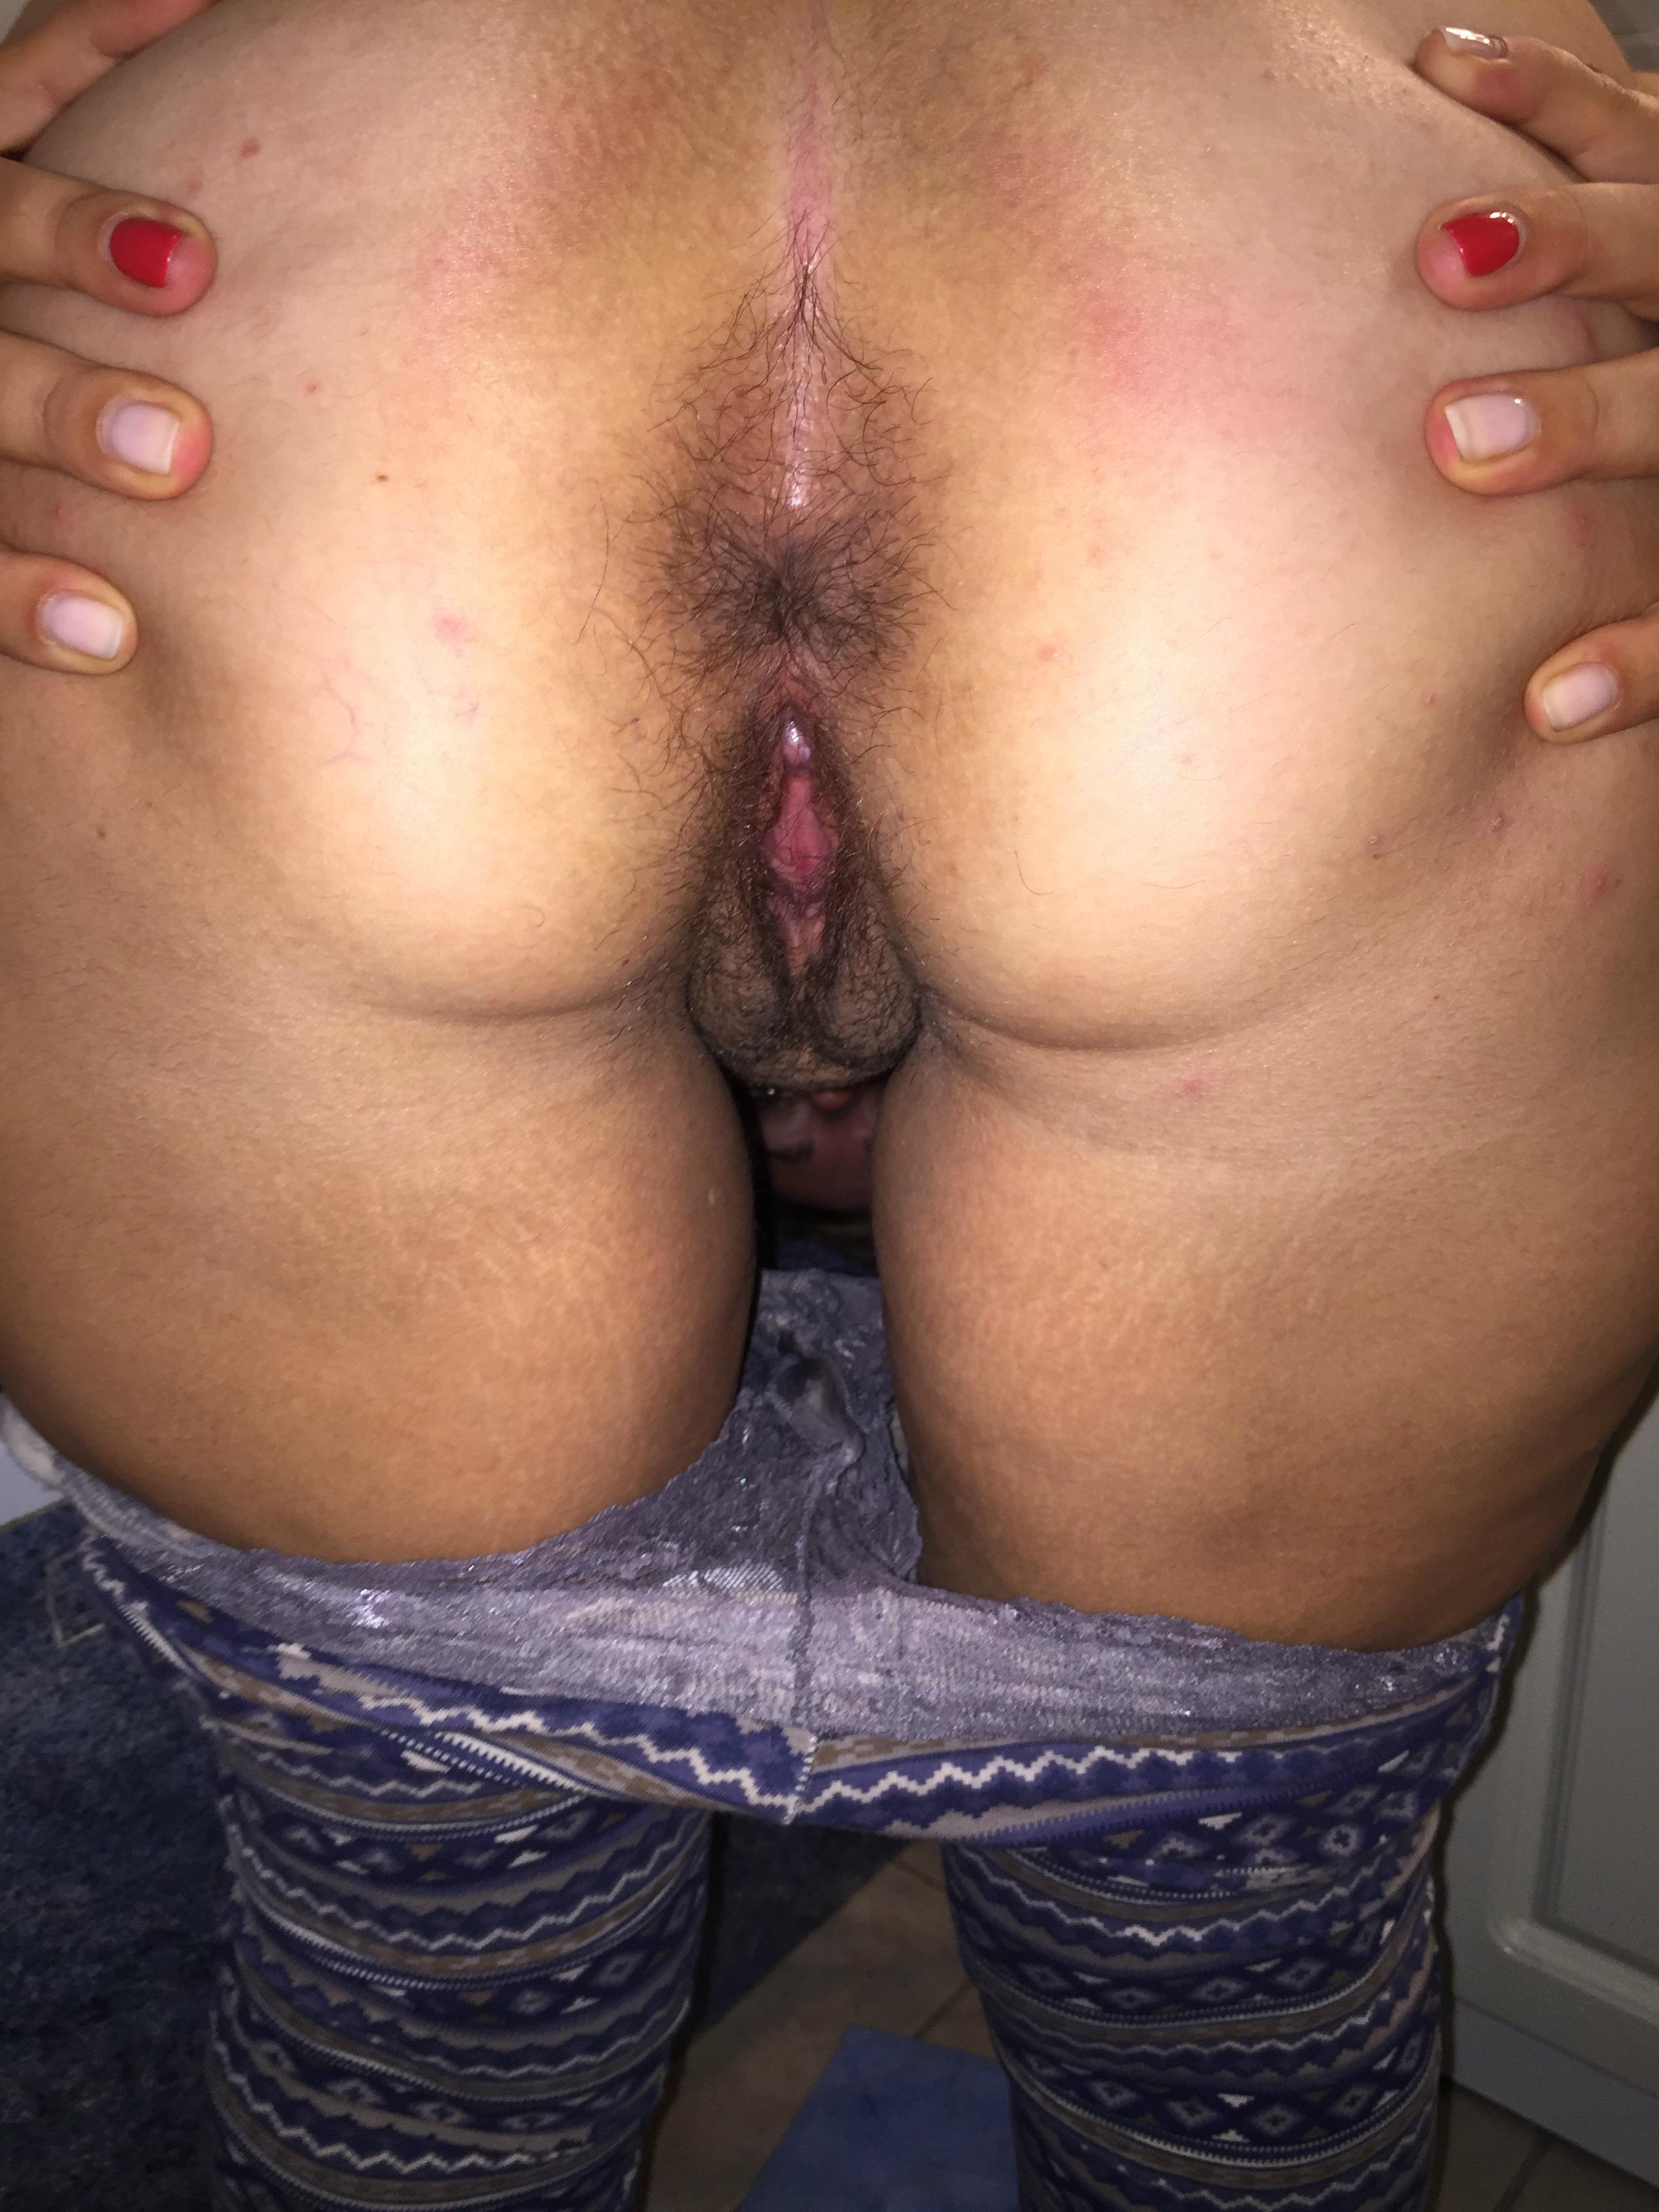 Slutload fusk my indian ass